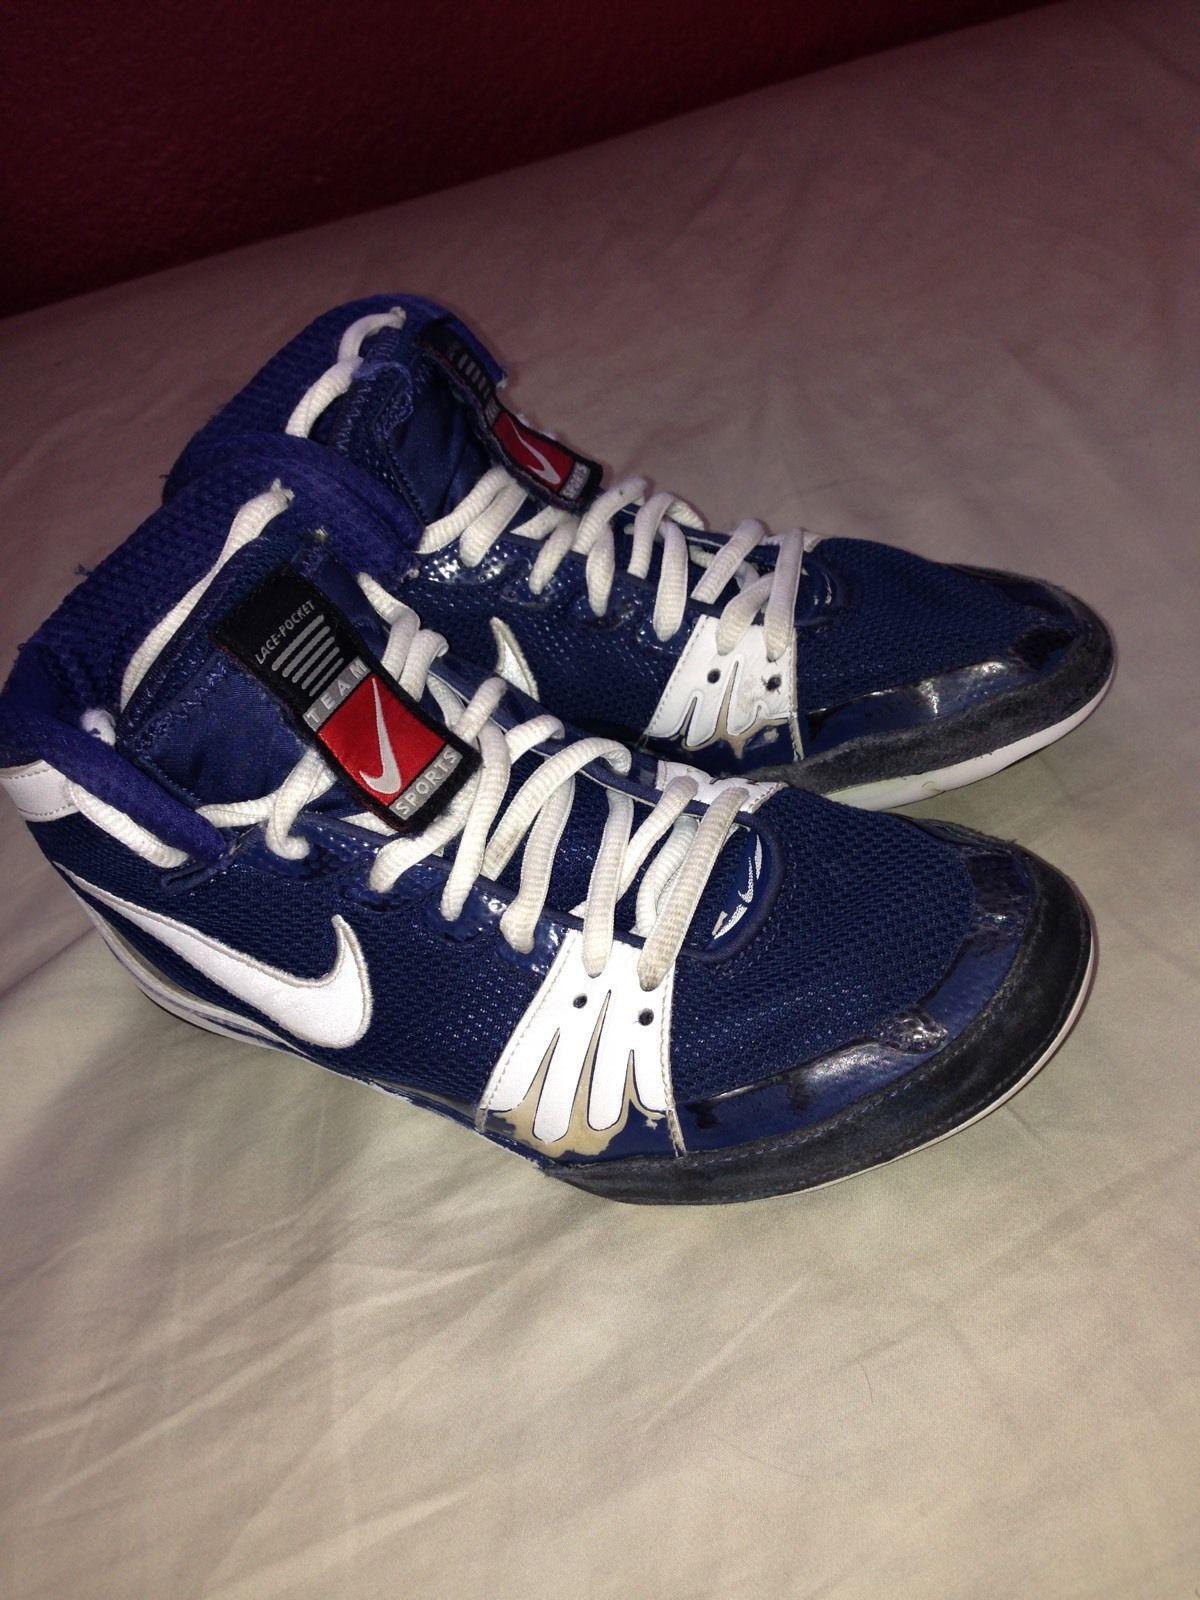 Rare Nike Freeks sz.8.5. Wrestling Shoes